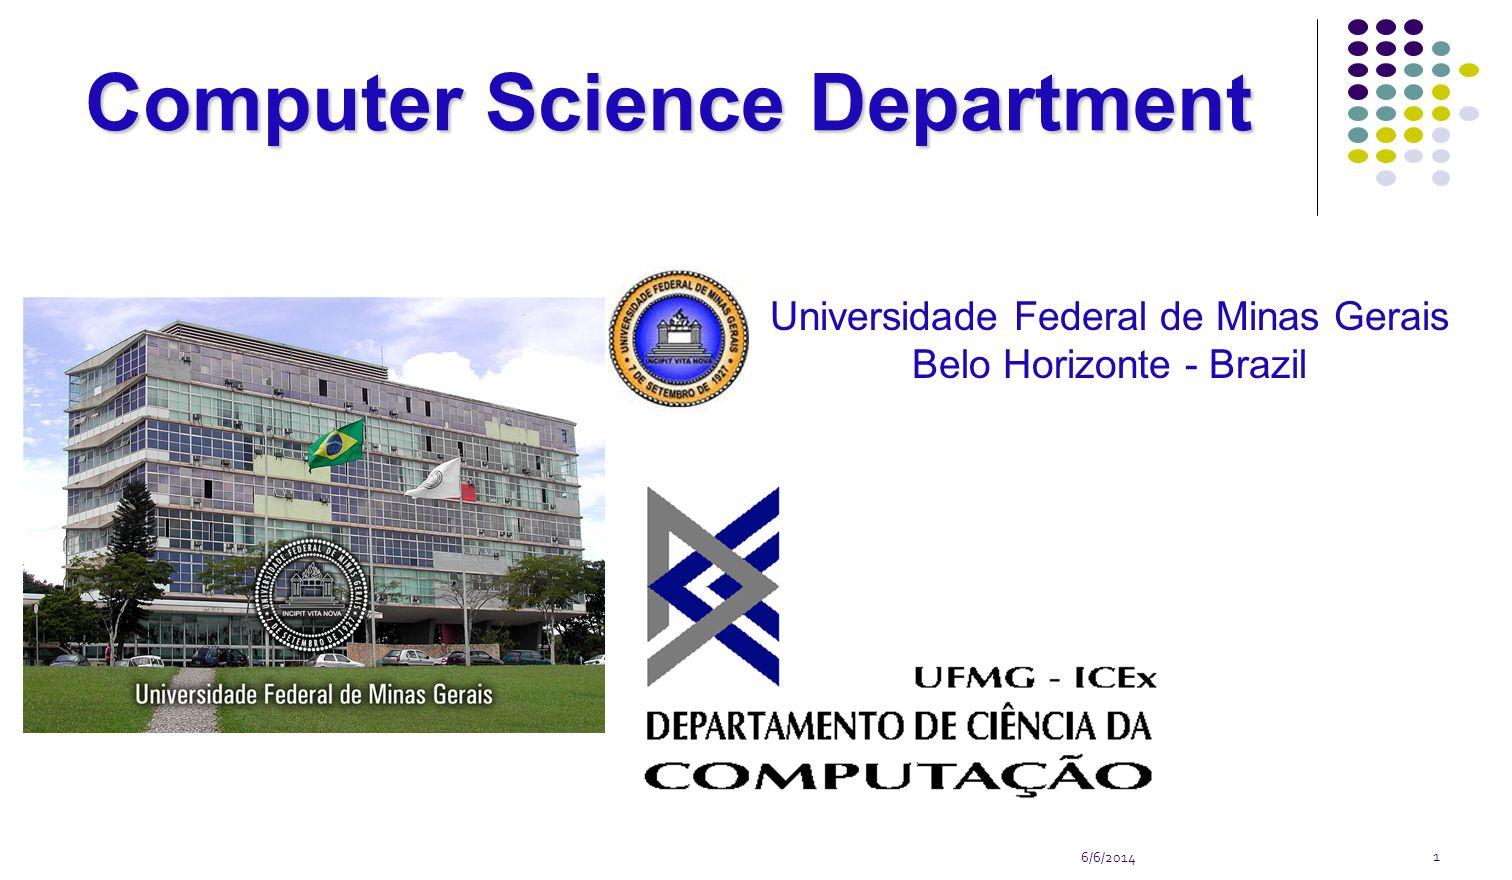 6/6/2014 1 Computer Science Department Universidade Federal de Minas Gerais Belo Horizonte - Brazil